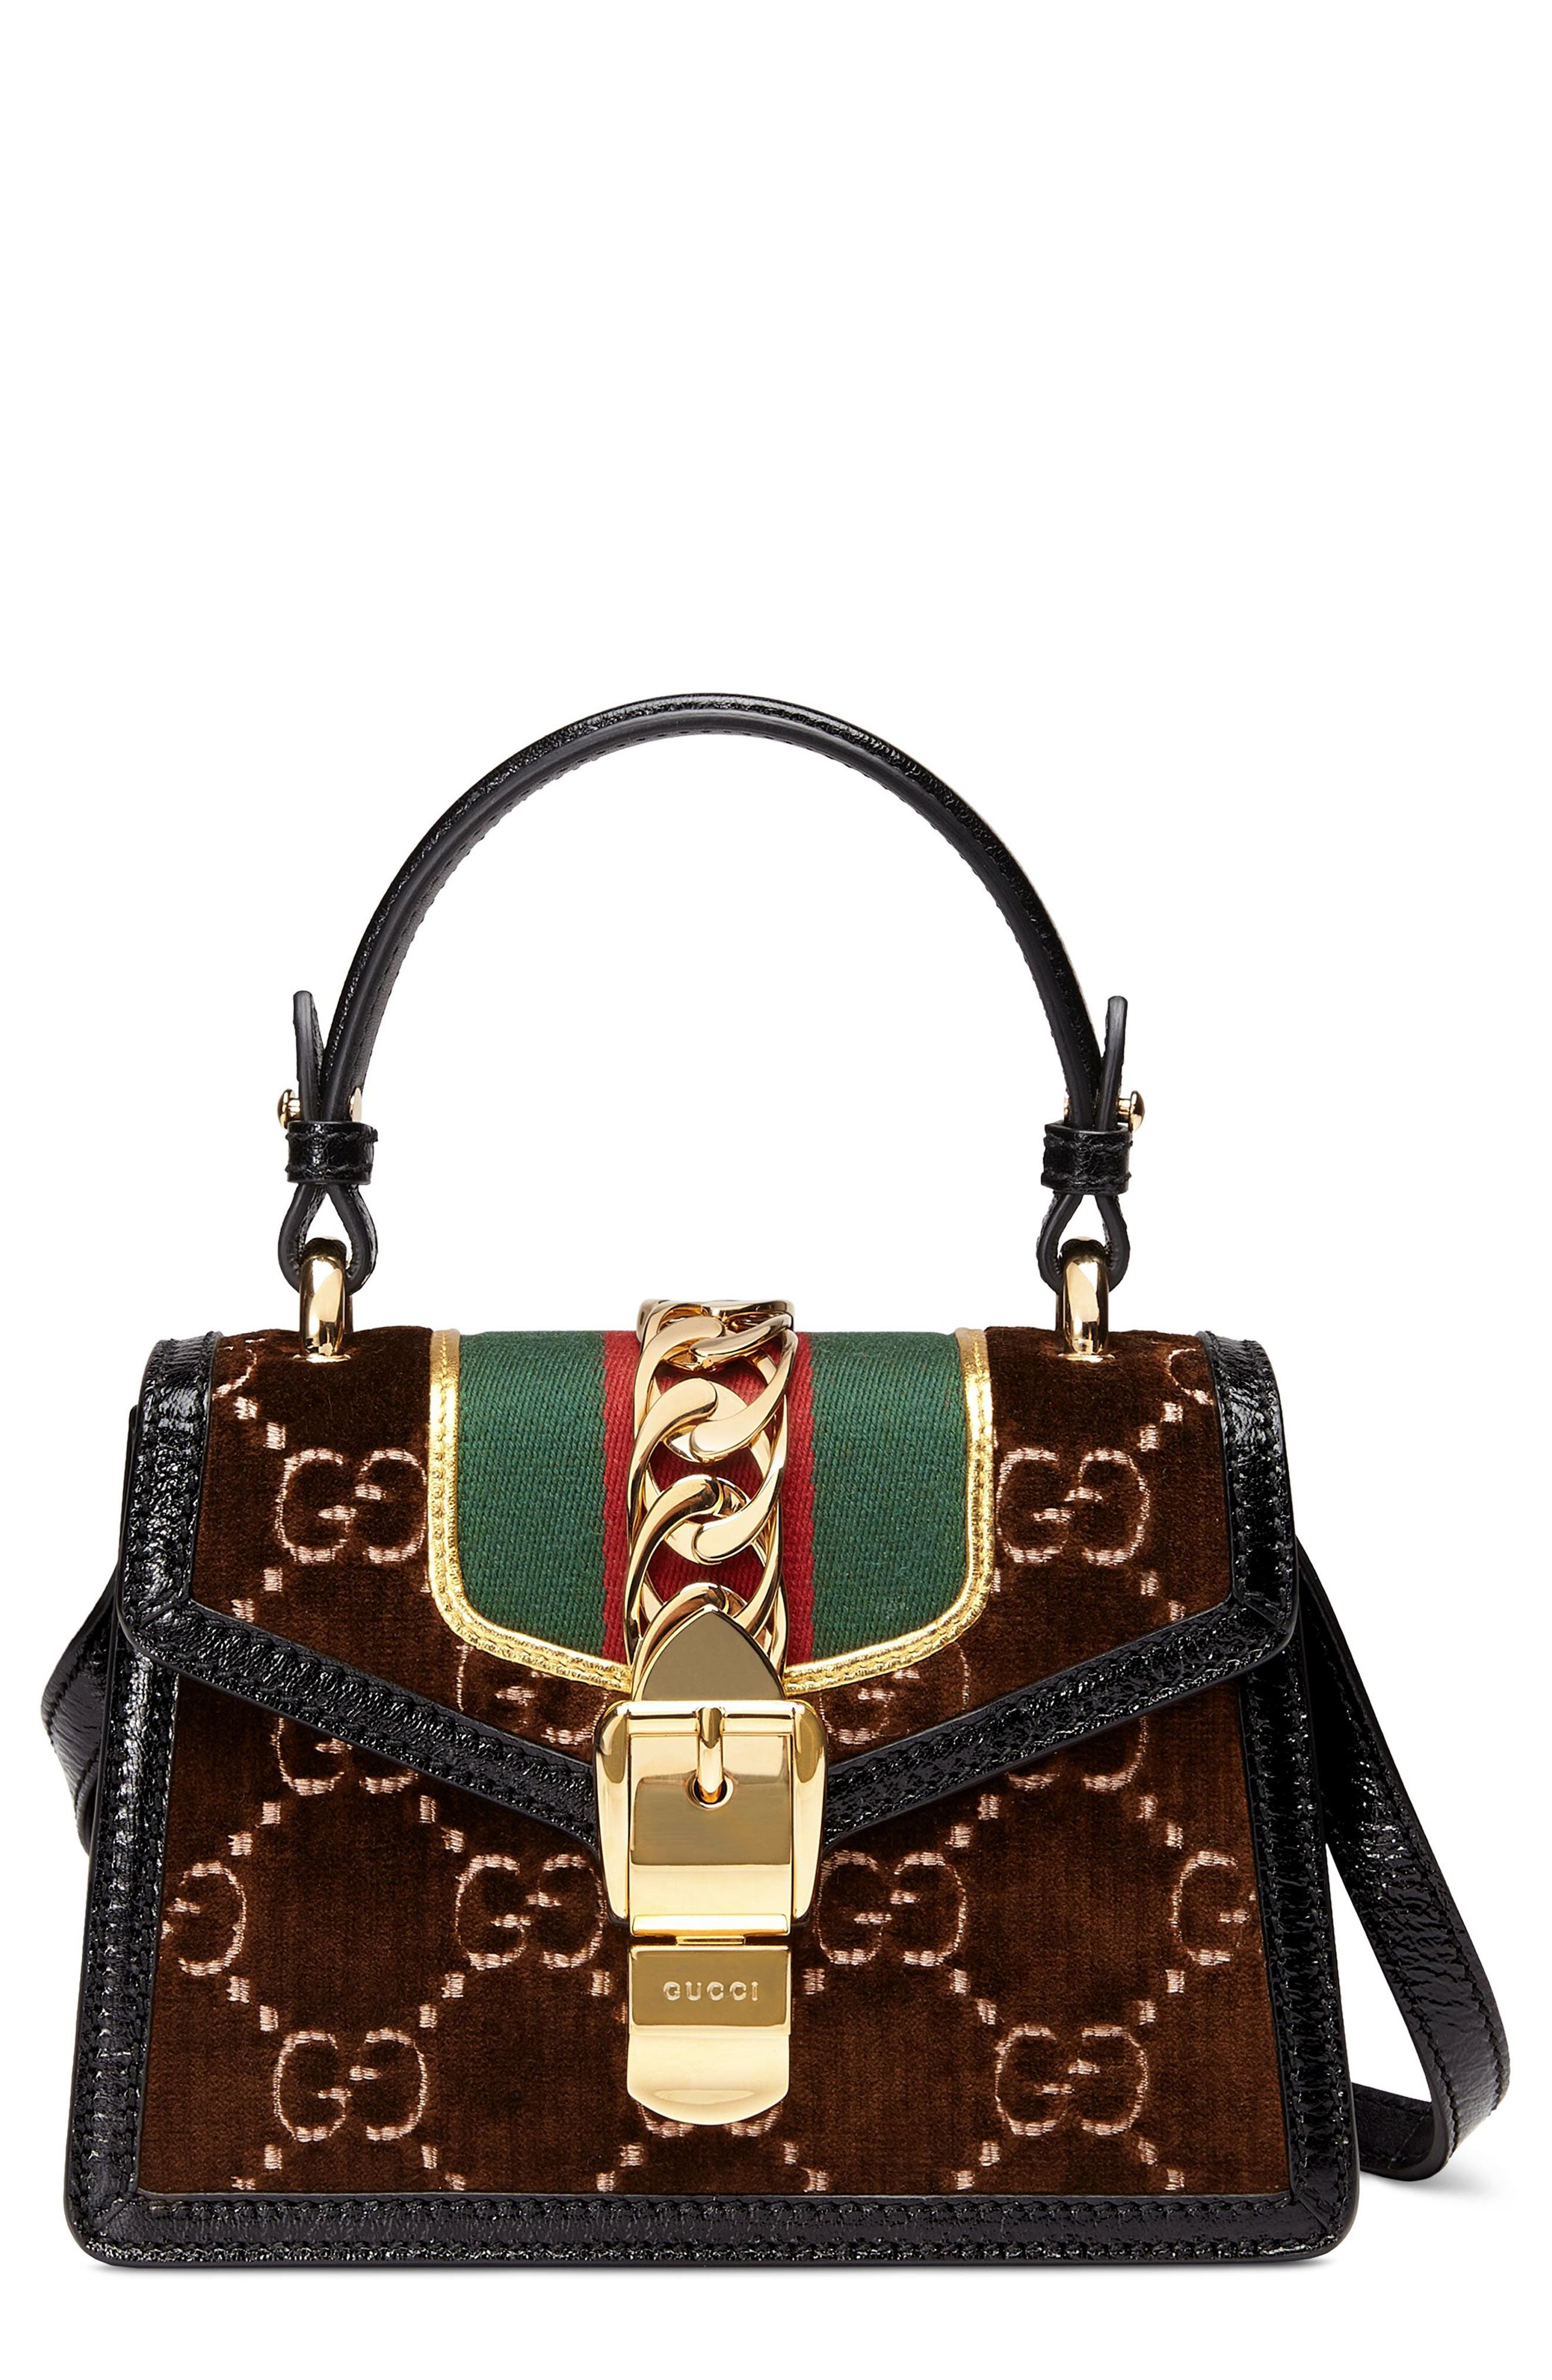 Mini Sylvie Velvet Top Handle Bag,                             Main thumbnail 1, color,                             BROWN/ NERO/ VERT RED VERT